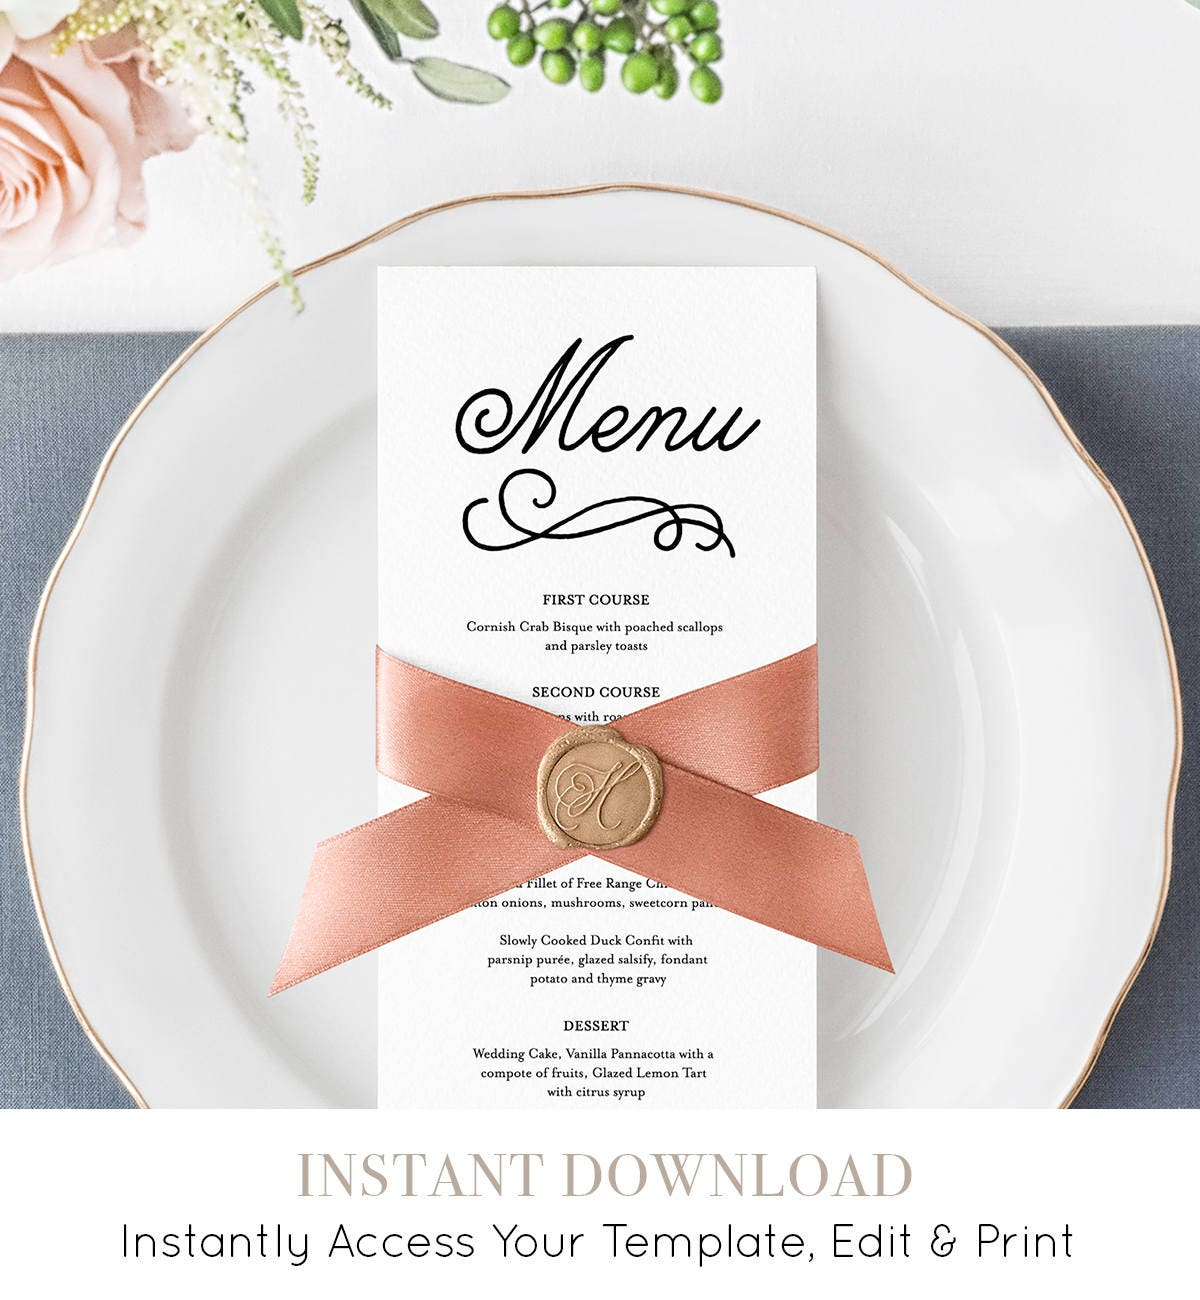 Editable Menu Template Romantic Wedding Reception Card Printable Men 100 Instant Download Digital Templett 035 105WM